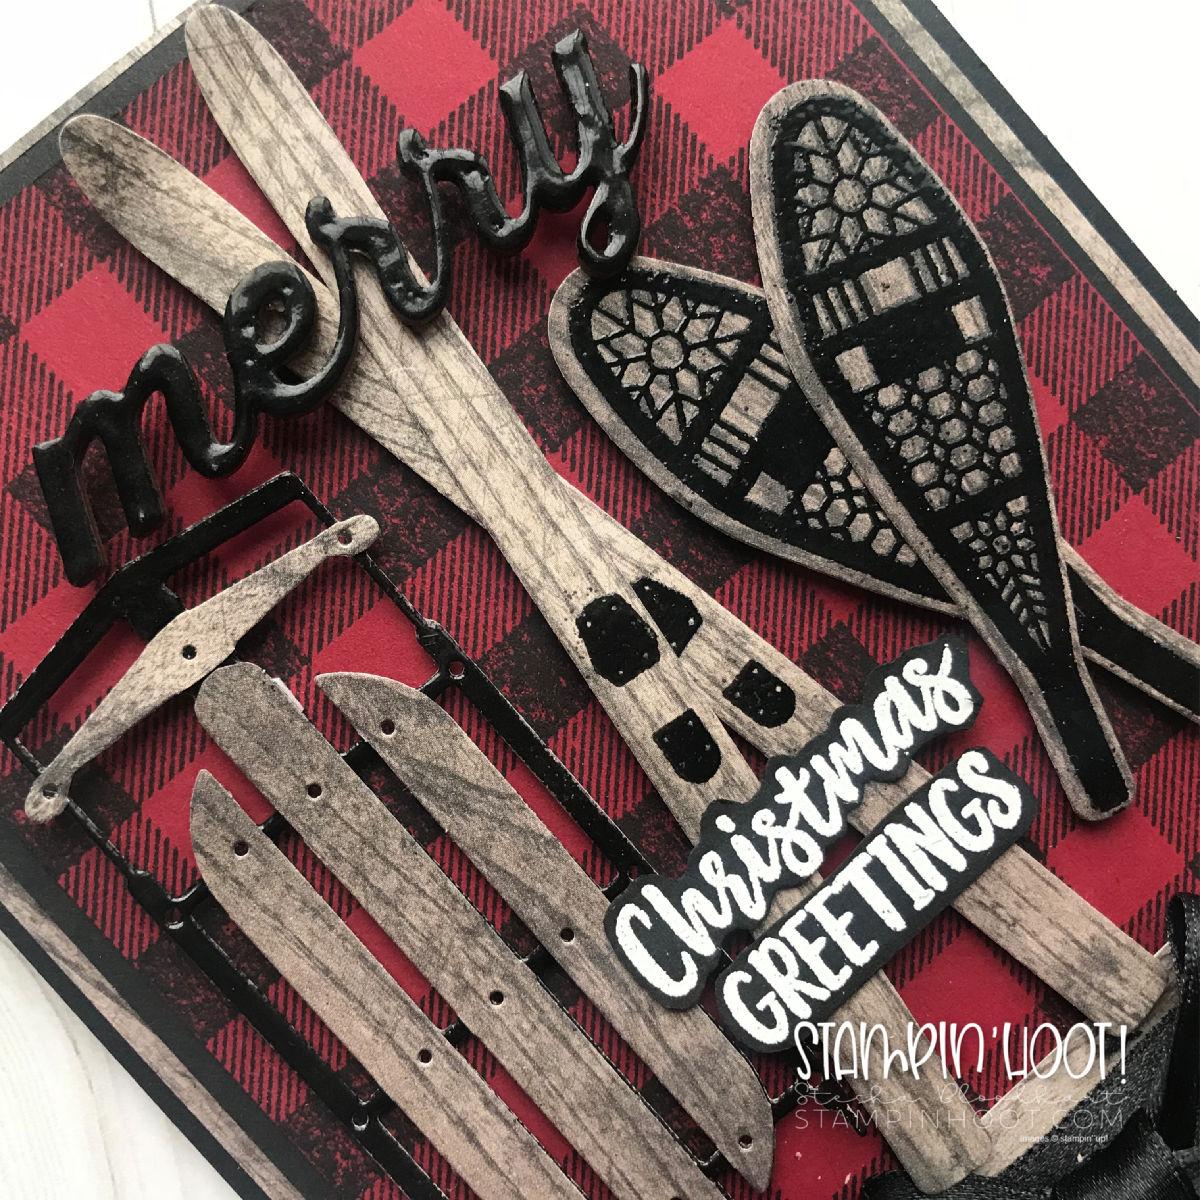 Buffalo Check Stamp Set & Alpine Adventures Bundle by Stampin' Up! Northwoods Christmas Card created by Stesha Bloodhart. Stampin' Hoot! #steshabloodhart #stampinhoot